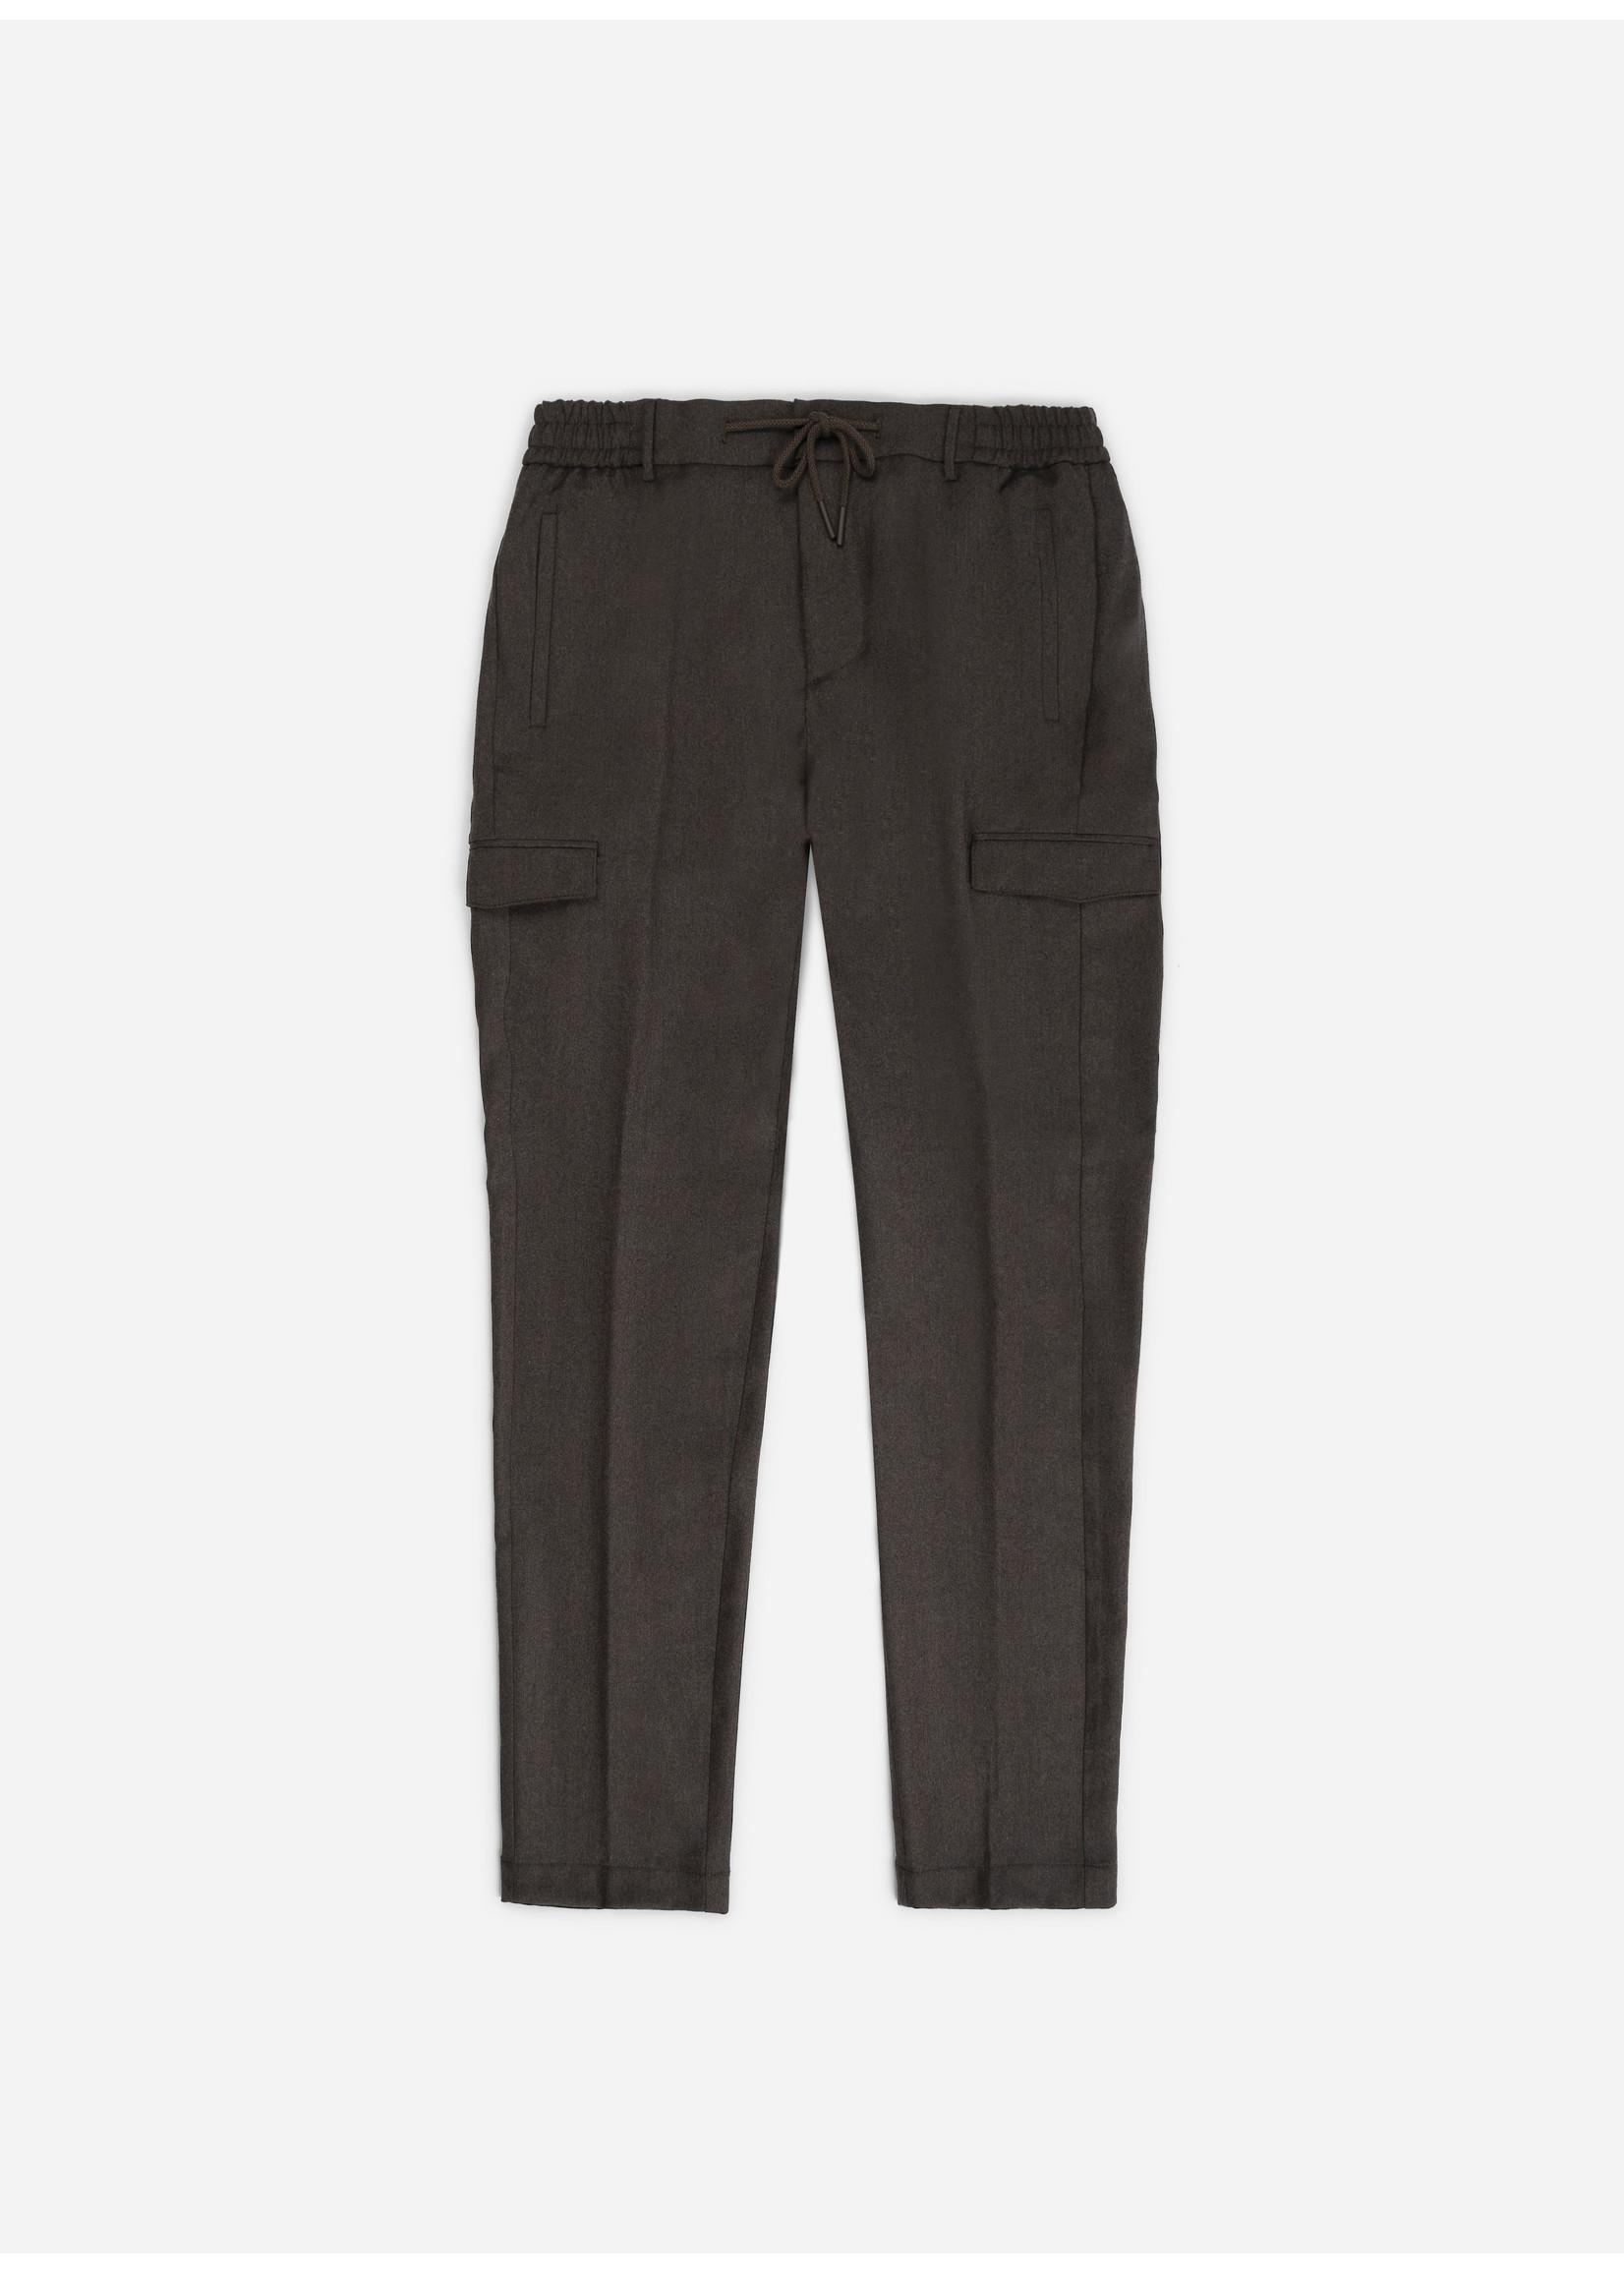 Ridiculous Classic Pantalone brown